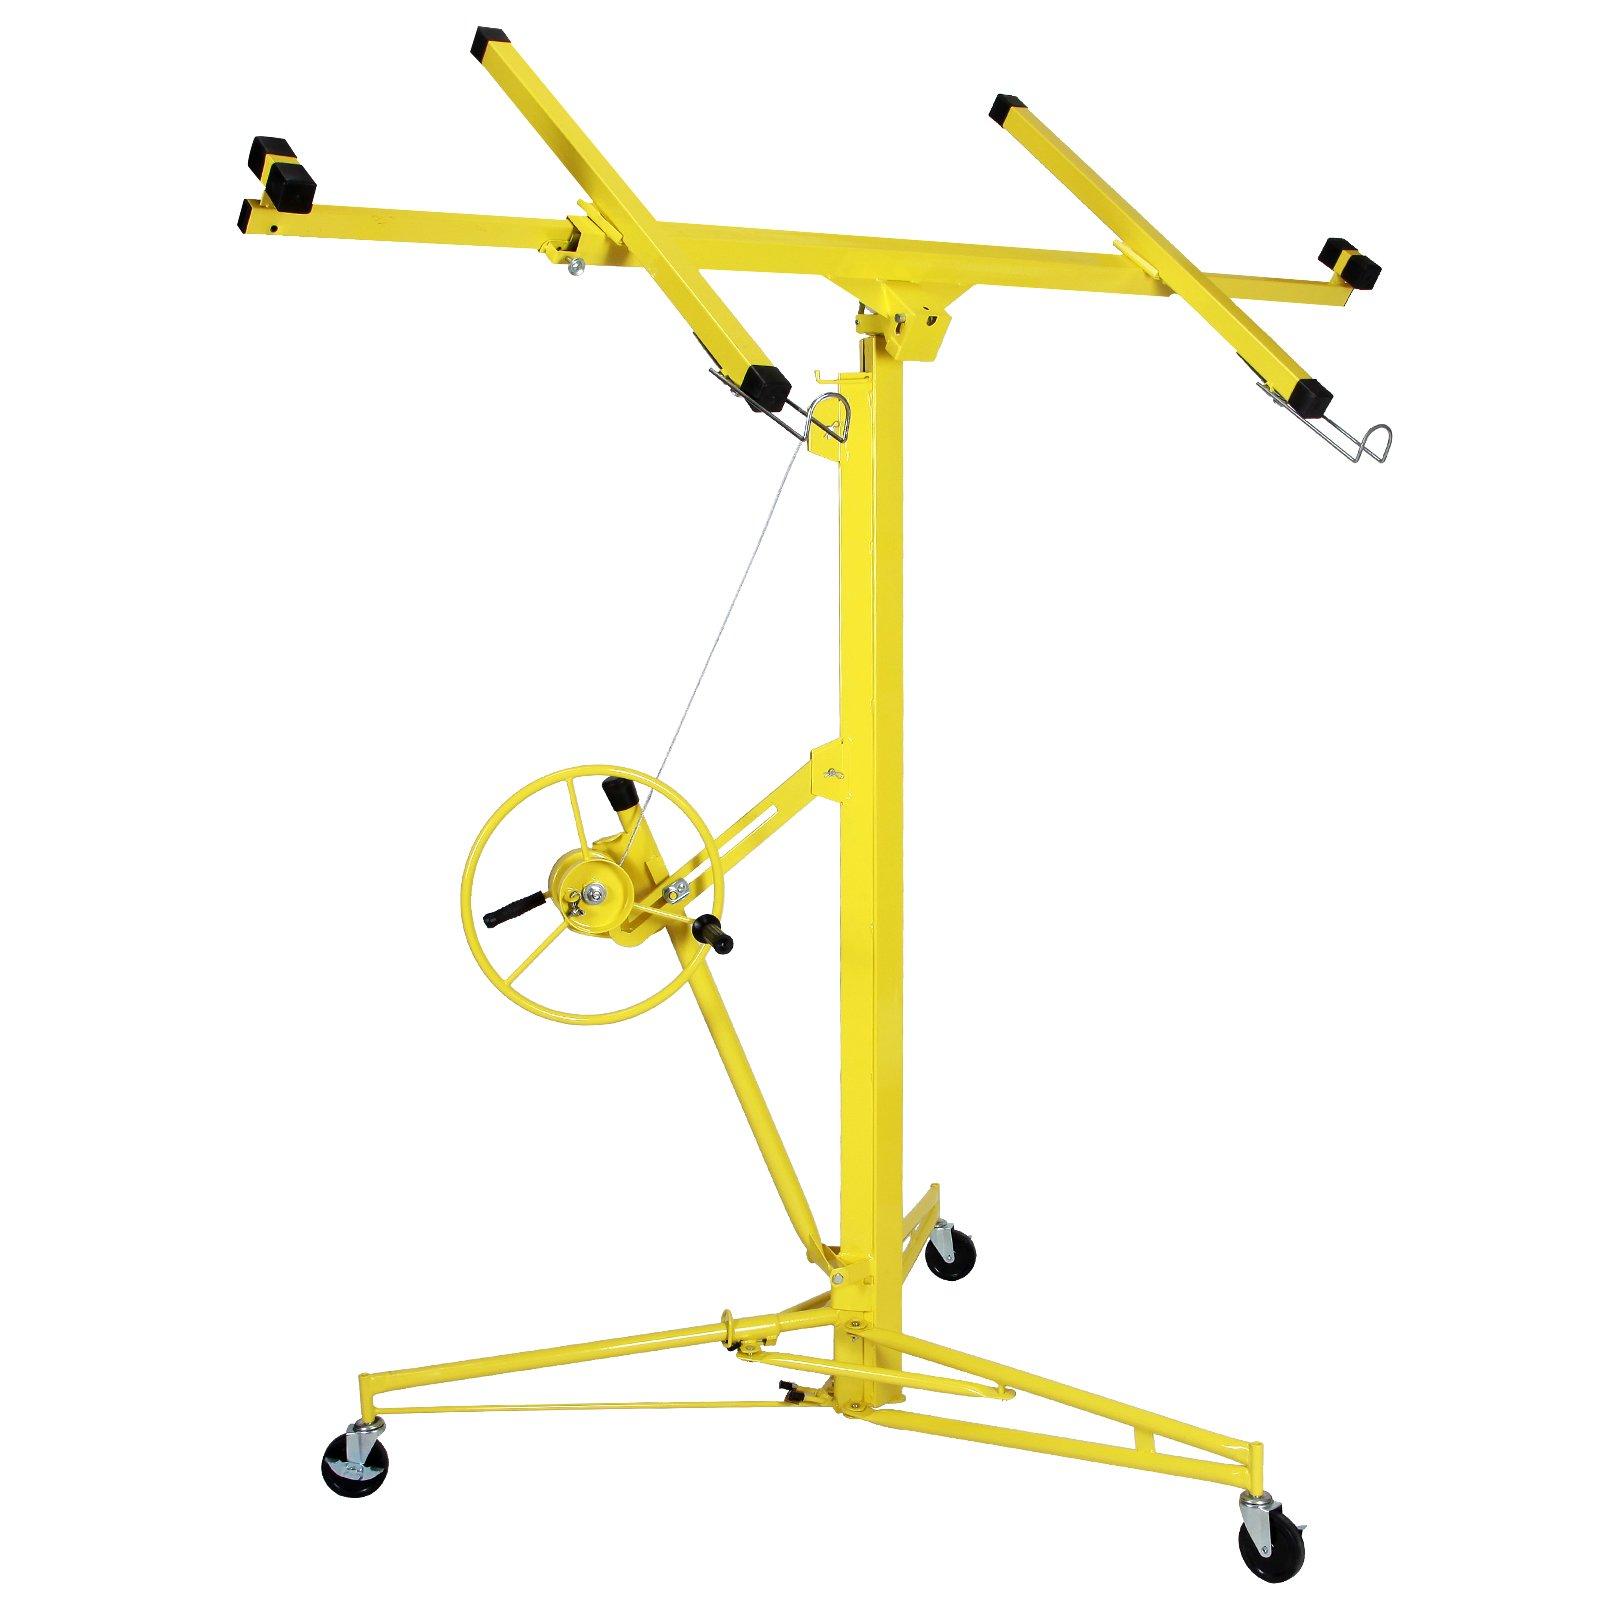 Heavy Duty Drywall & Panel Lift Hoist Professional 16-19' Jack Lifter Construction Tools Caster Lockable Yellow